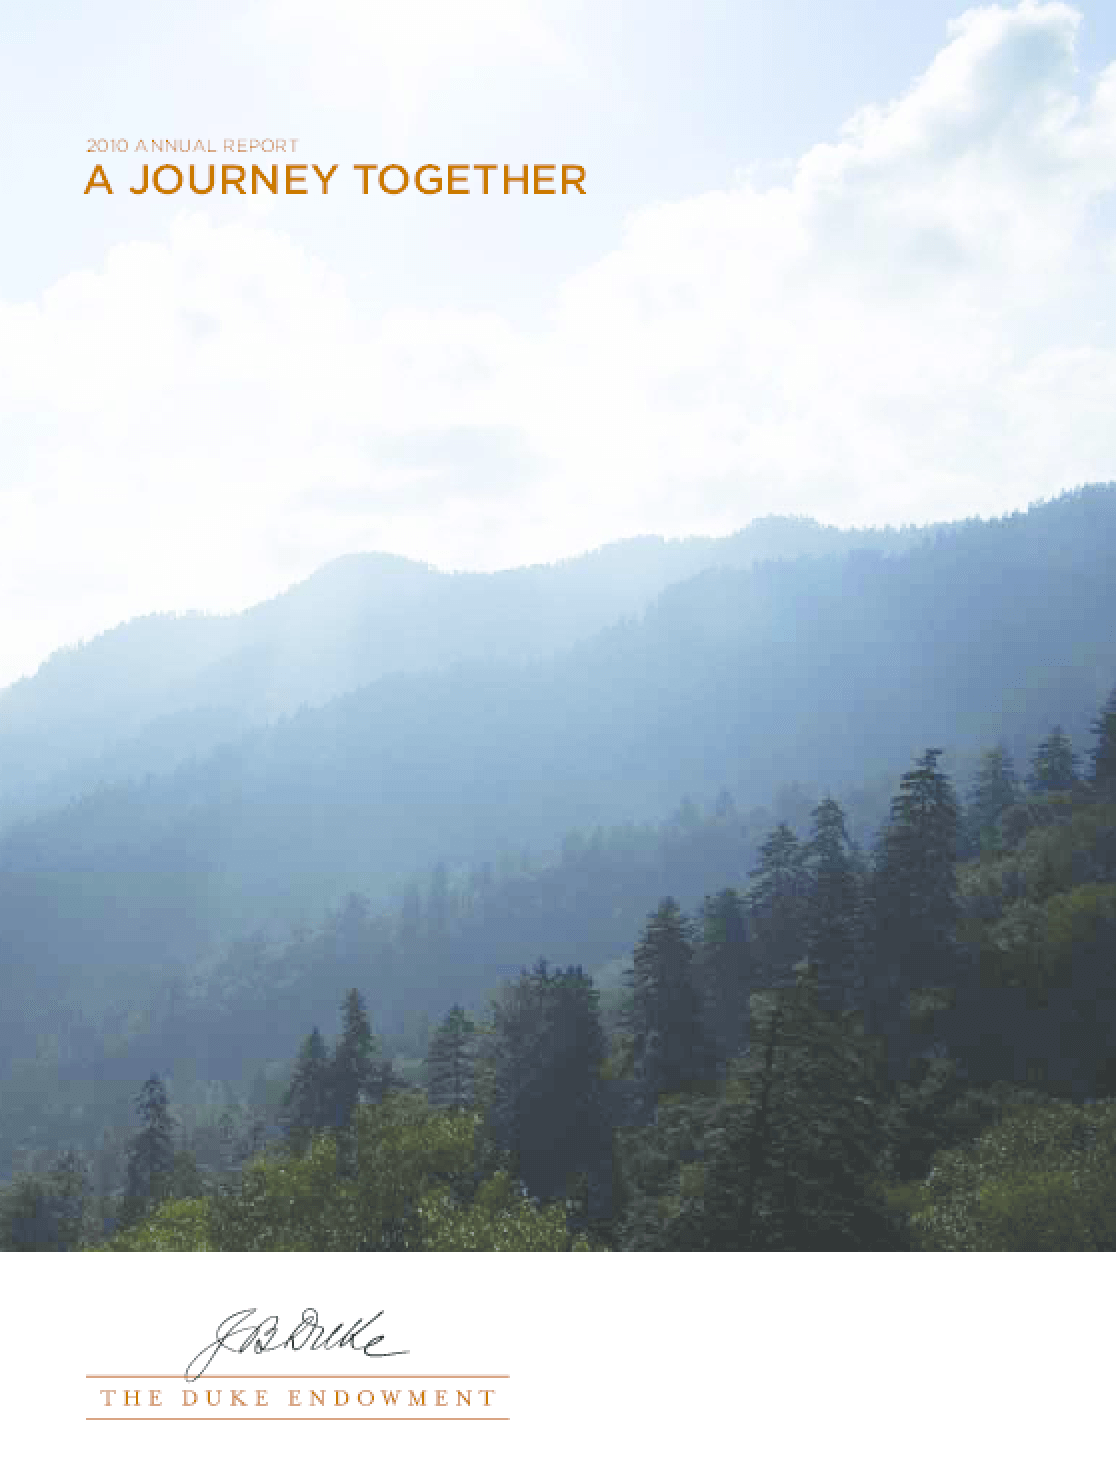 Duke Endowment 2010 Annual Report